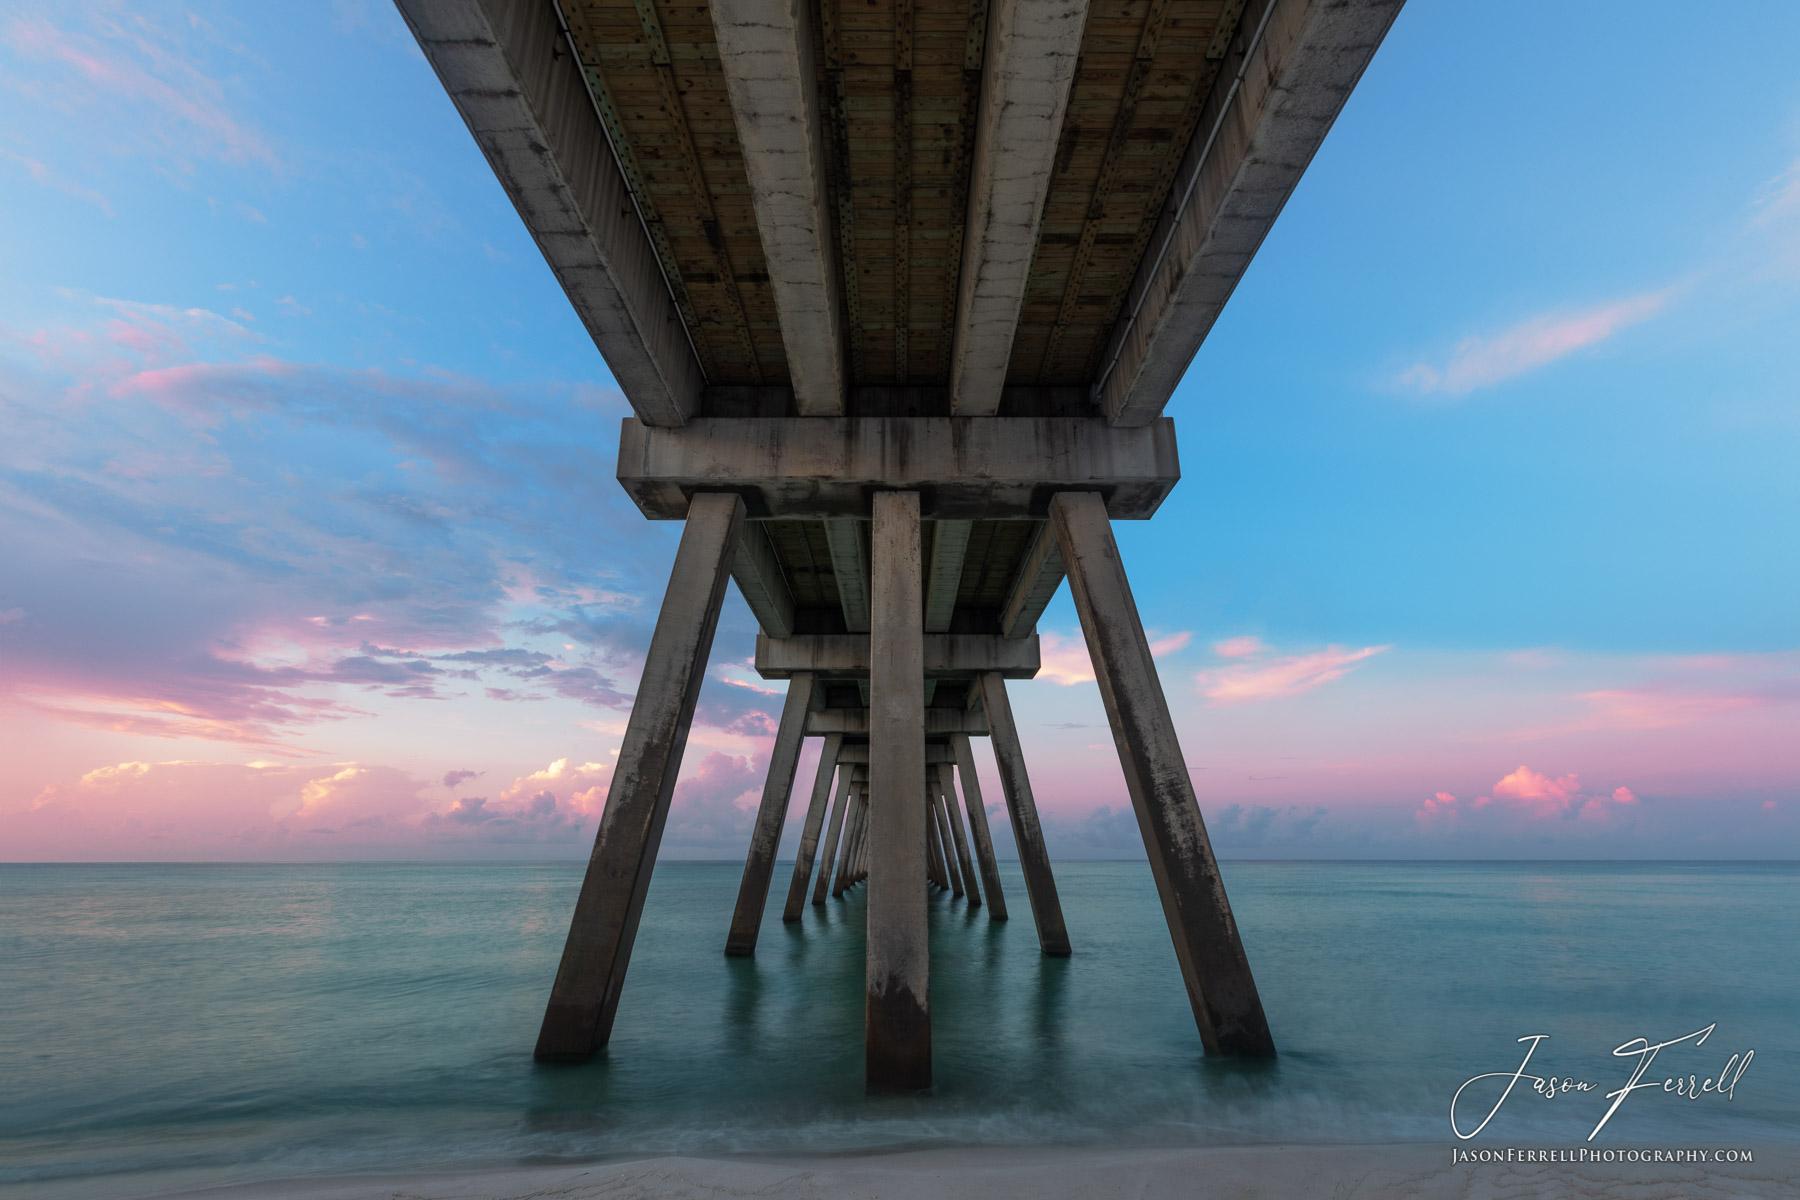 pier, beach, sunrise, pastels, pink, blue, green, under, beneath, santa rosa island, photo